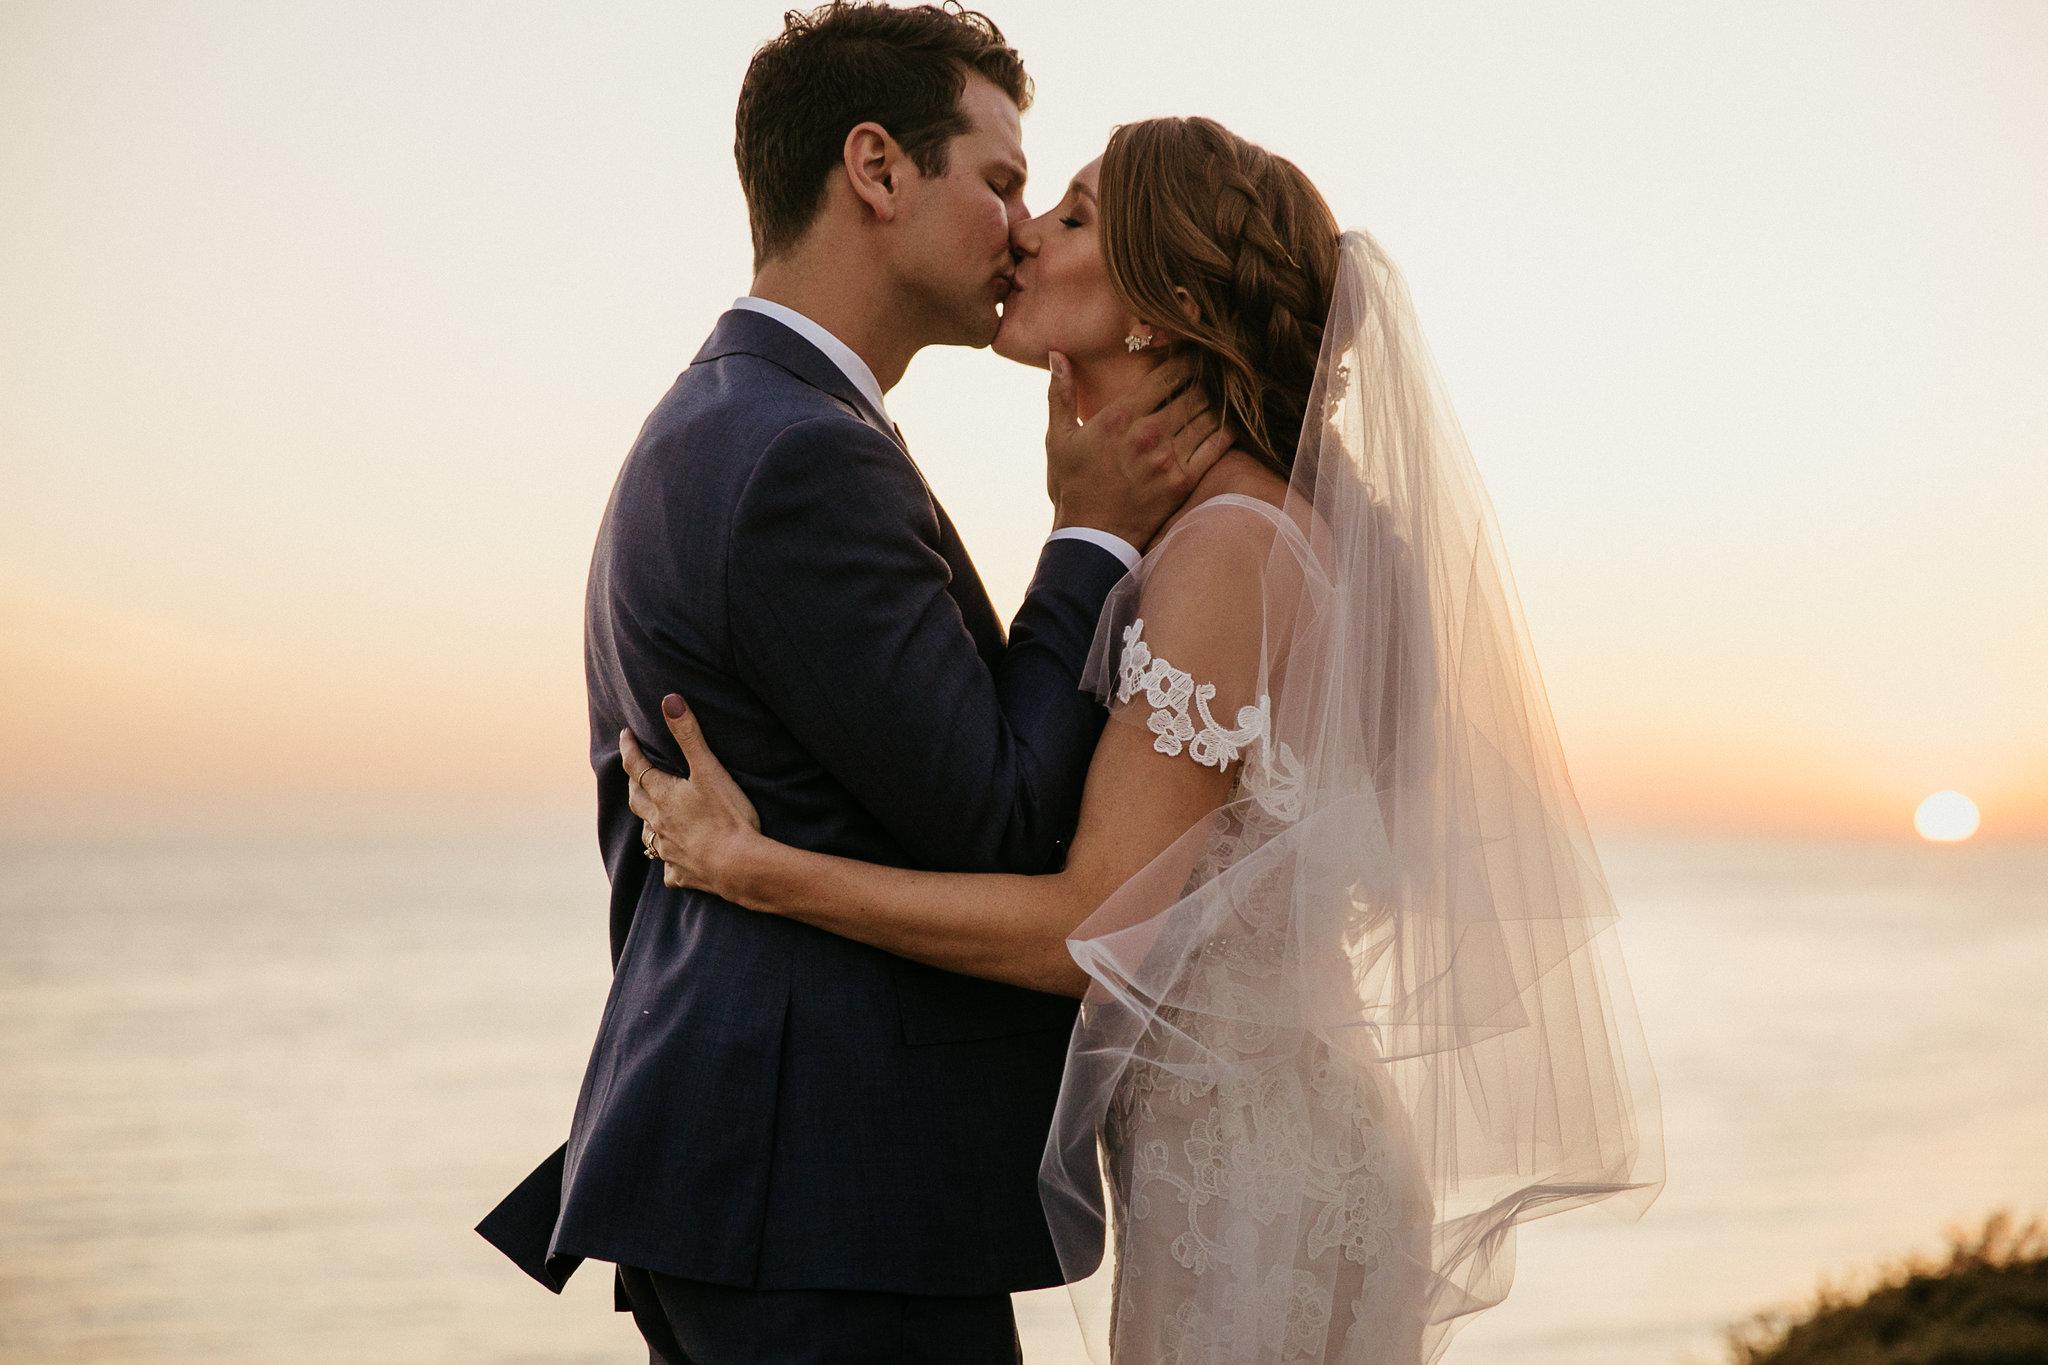 santa-barbara-elopement-wedding-planner-planning-coordinator-day-of-ellwood-bluff-ocean-front-view-bacara-resort-ritz-carlton-porsche-downtown (28).jpg